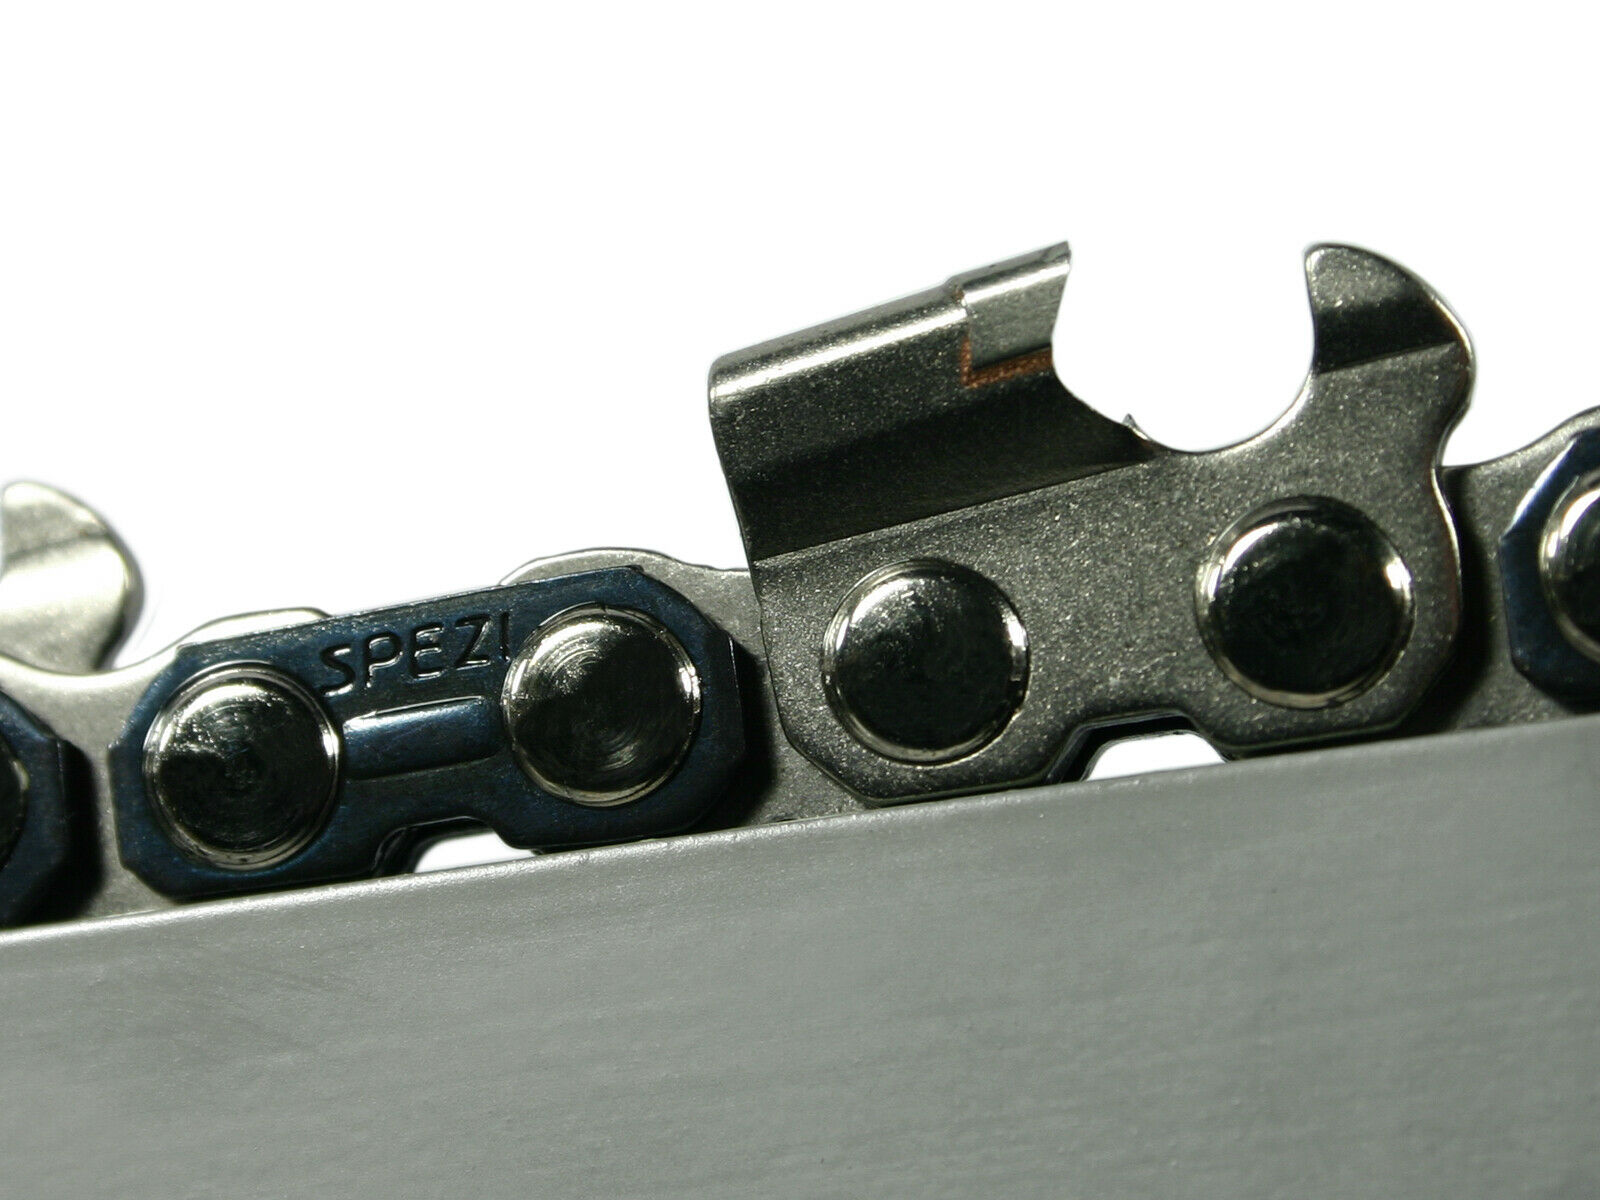 Metal duro cadena sierra adecuado para Husqvarna 49 50 cm 3 8  72 TG 1,5 mm Cochebide